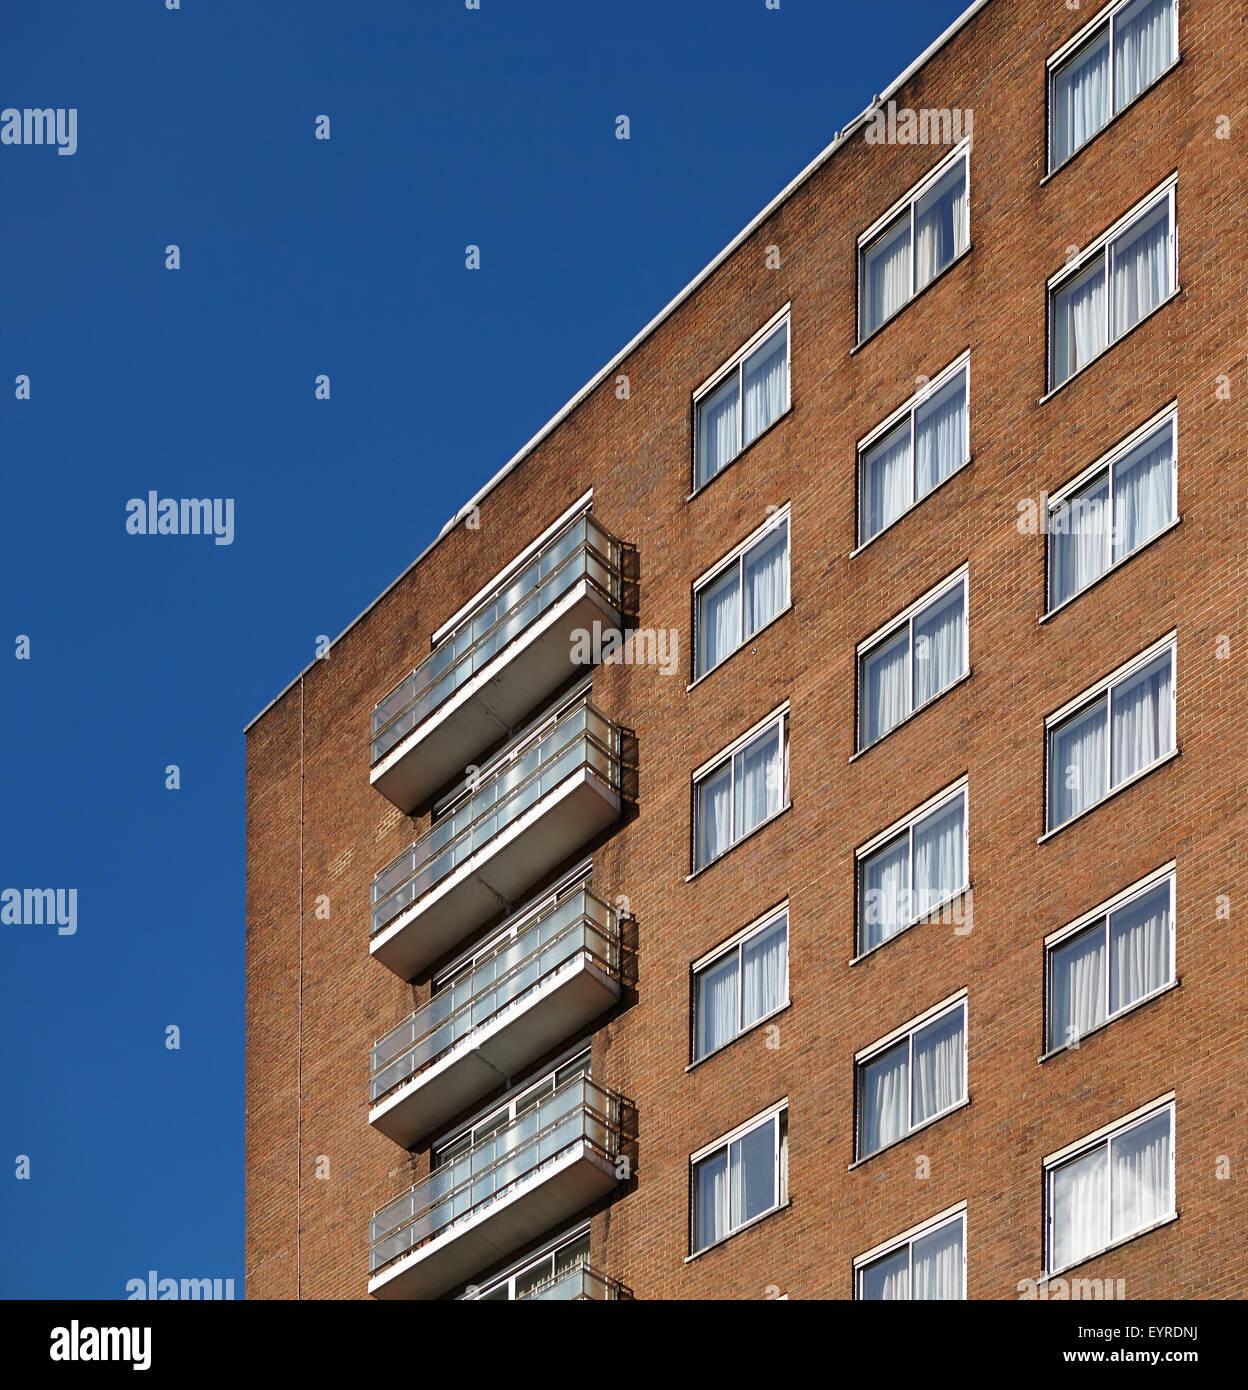 London Council housing - Stock Image